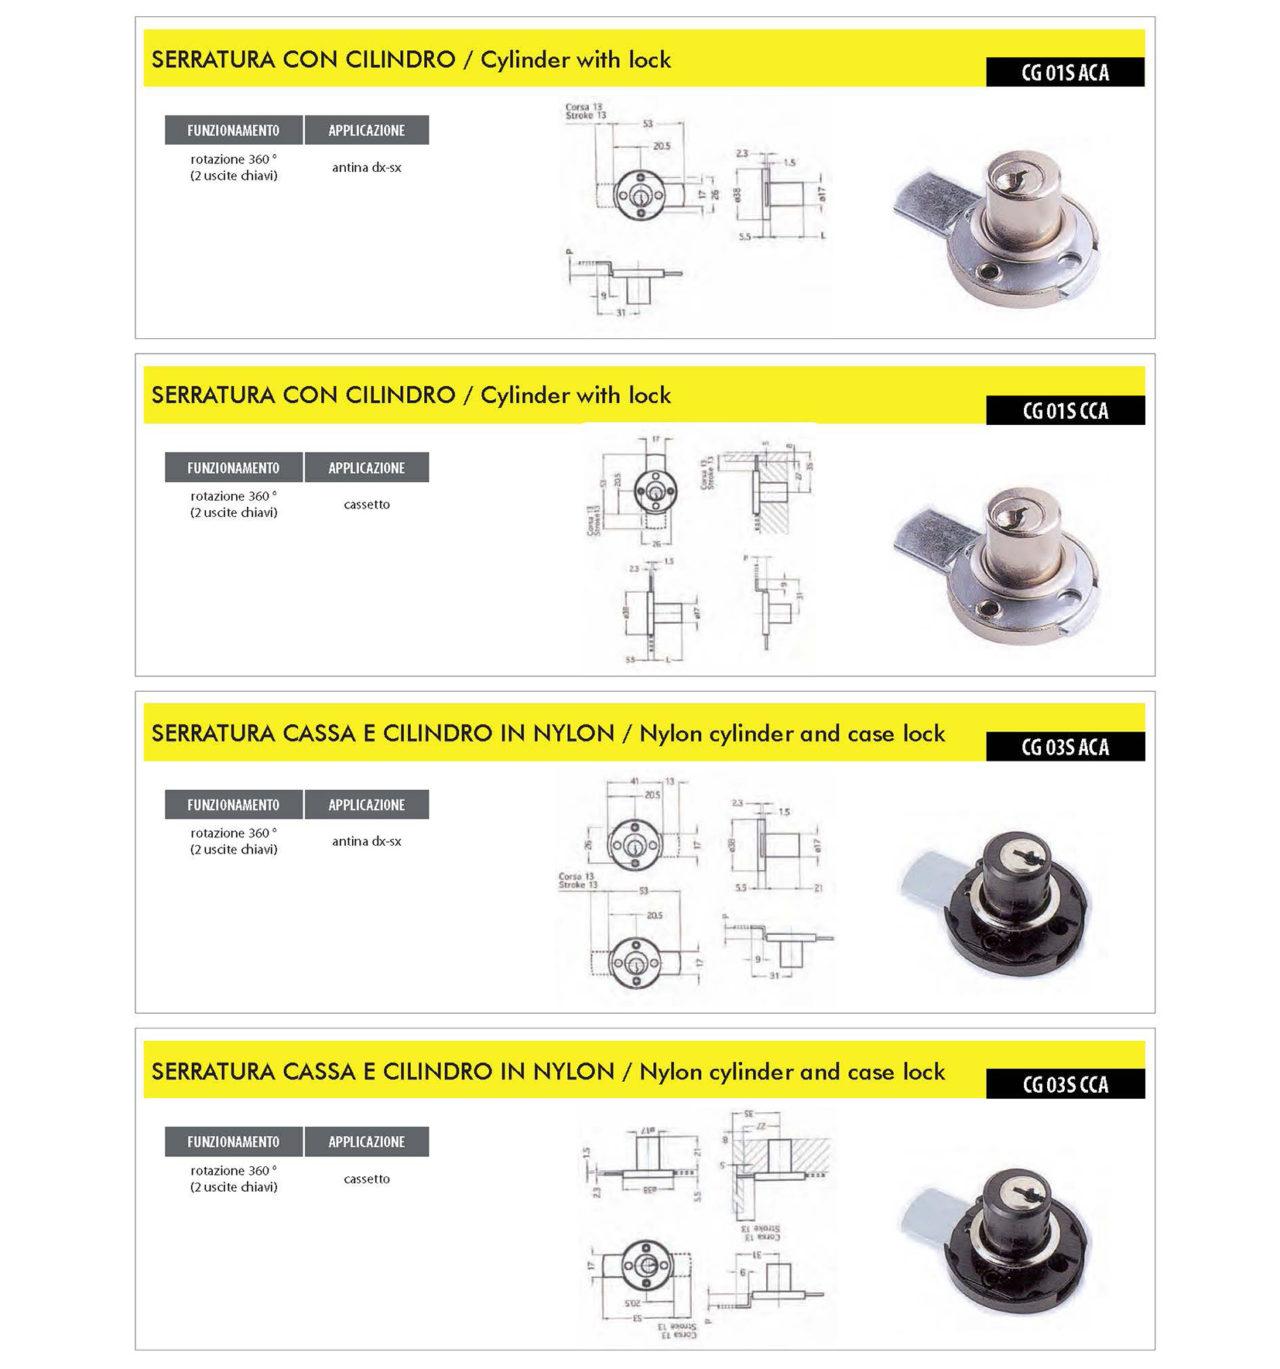 Pagine-da-CG-ferramenta_serrature-IIE-1280x1369.jpg